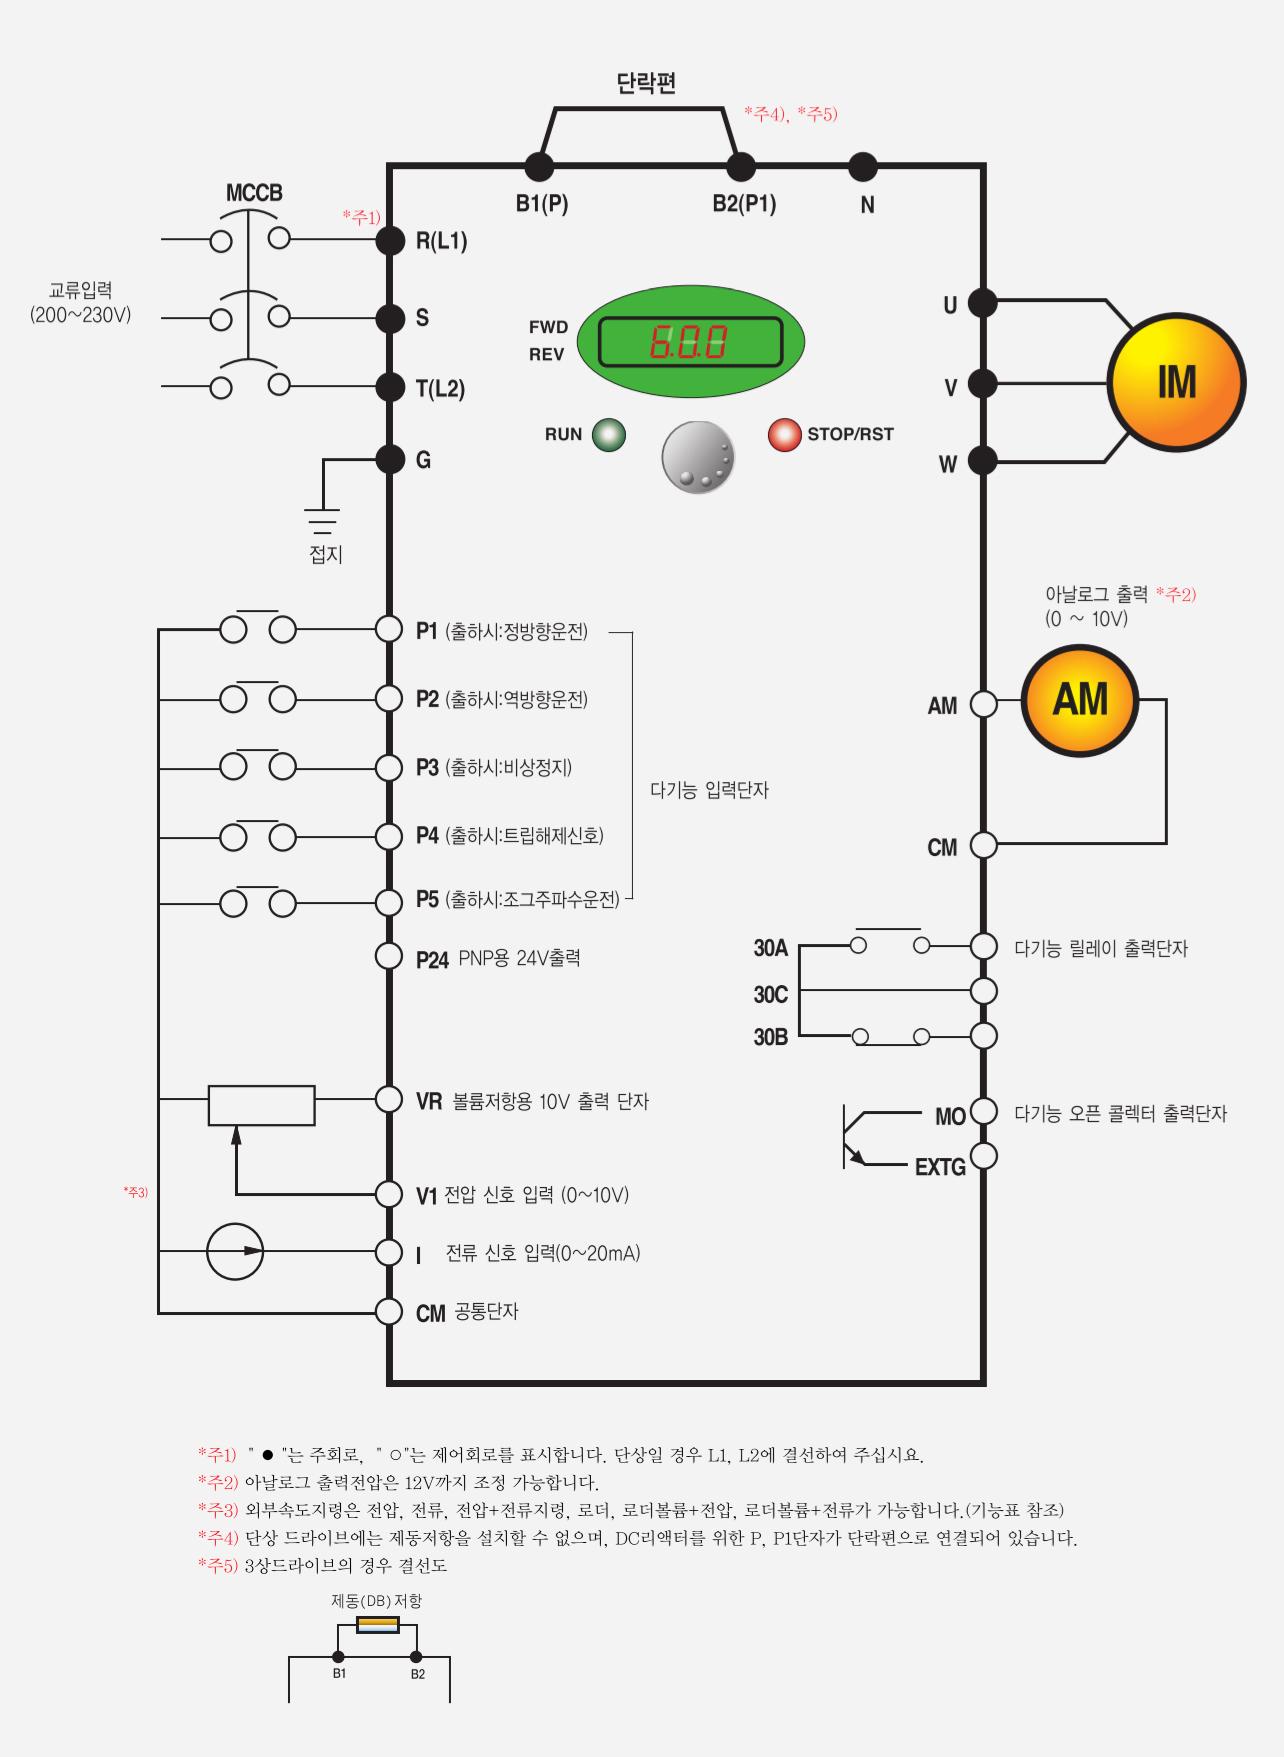 2sk network  u0026 shop   ud22c uc5d0 uc2a4 ucf00 uc774   uacf5 uad6c uc0c1 uac00  ub124 ud2b8 uc6cc ud06c